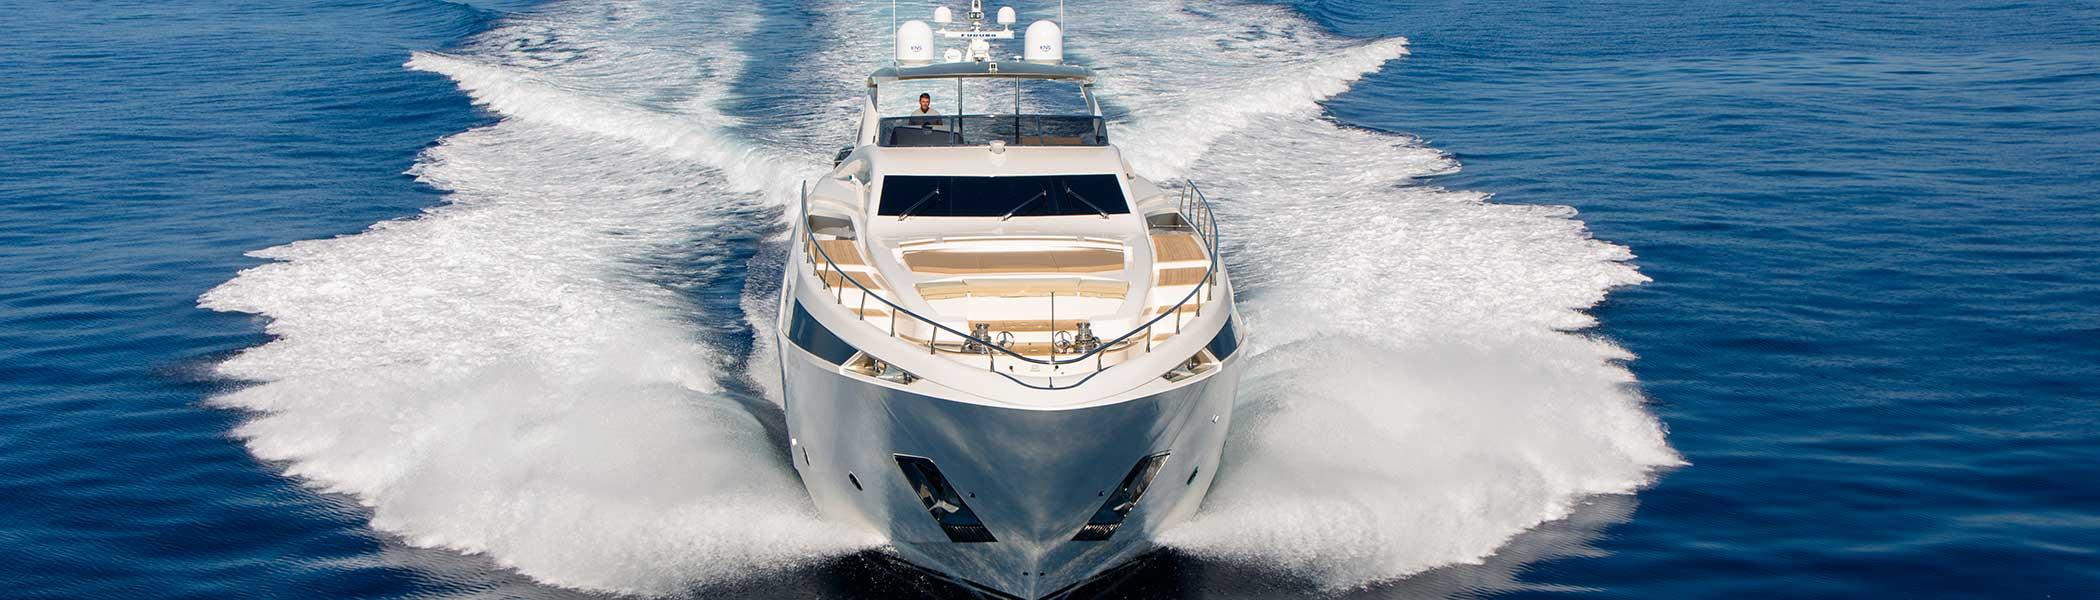 Amer Yacht - Amer CENTO NAVIGAZIONE-63